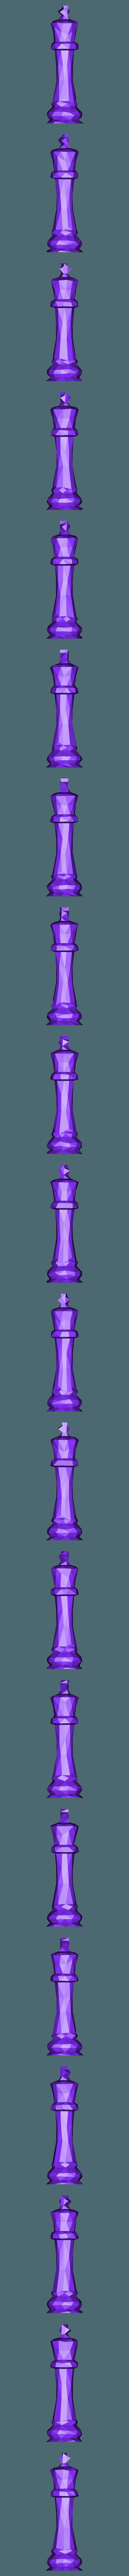 King.obj Download free OBJ file Chess Set LowPoly  • Model to 3D print, MarProZ_3D